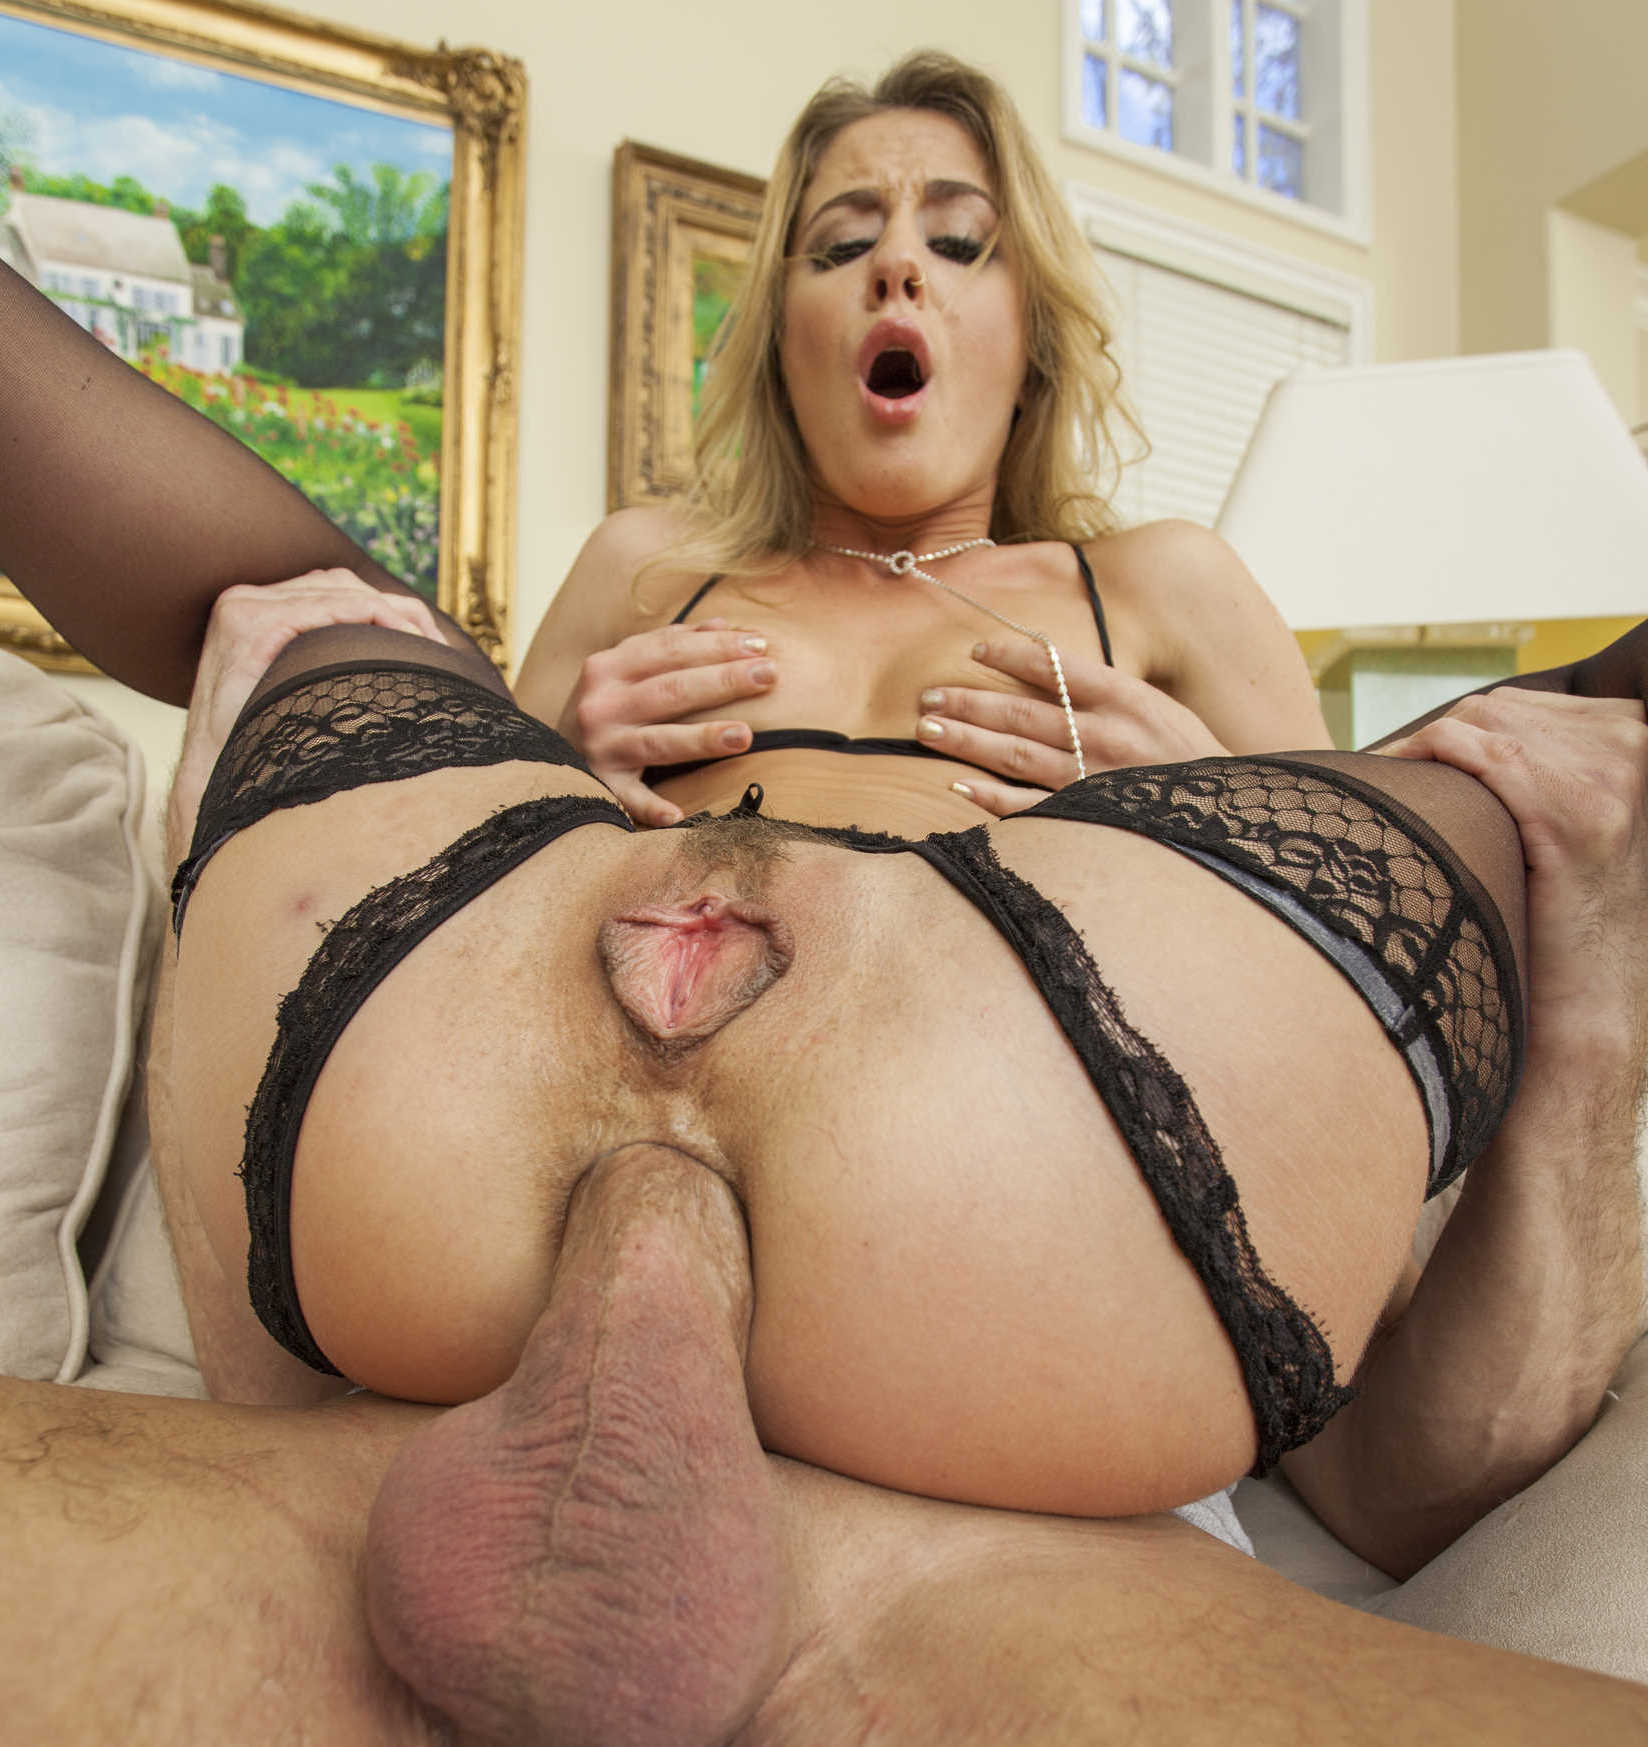 Красивая Жопа Мам Секс